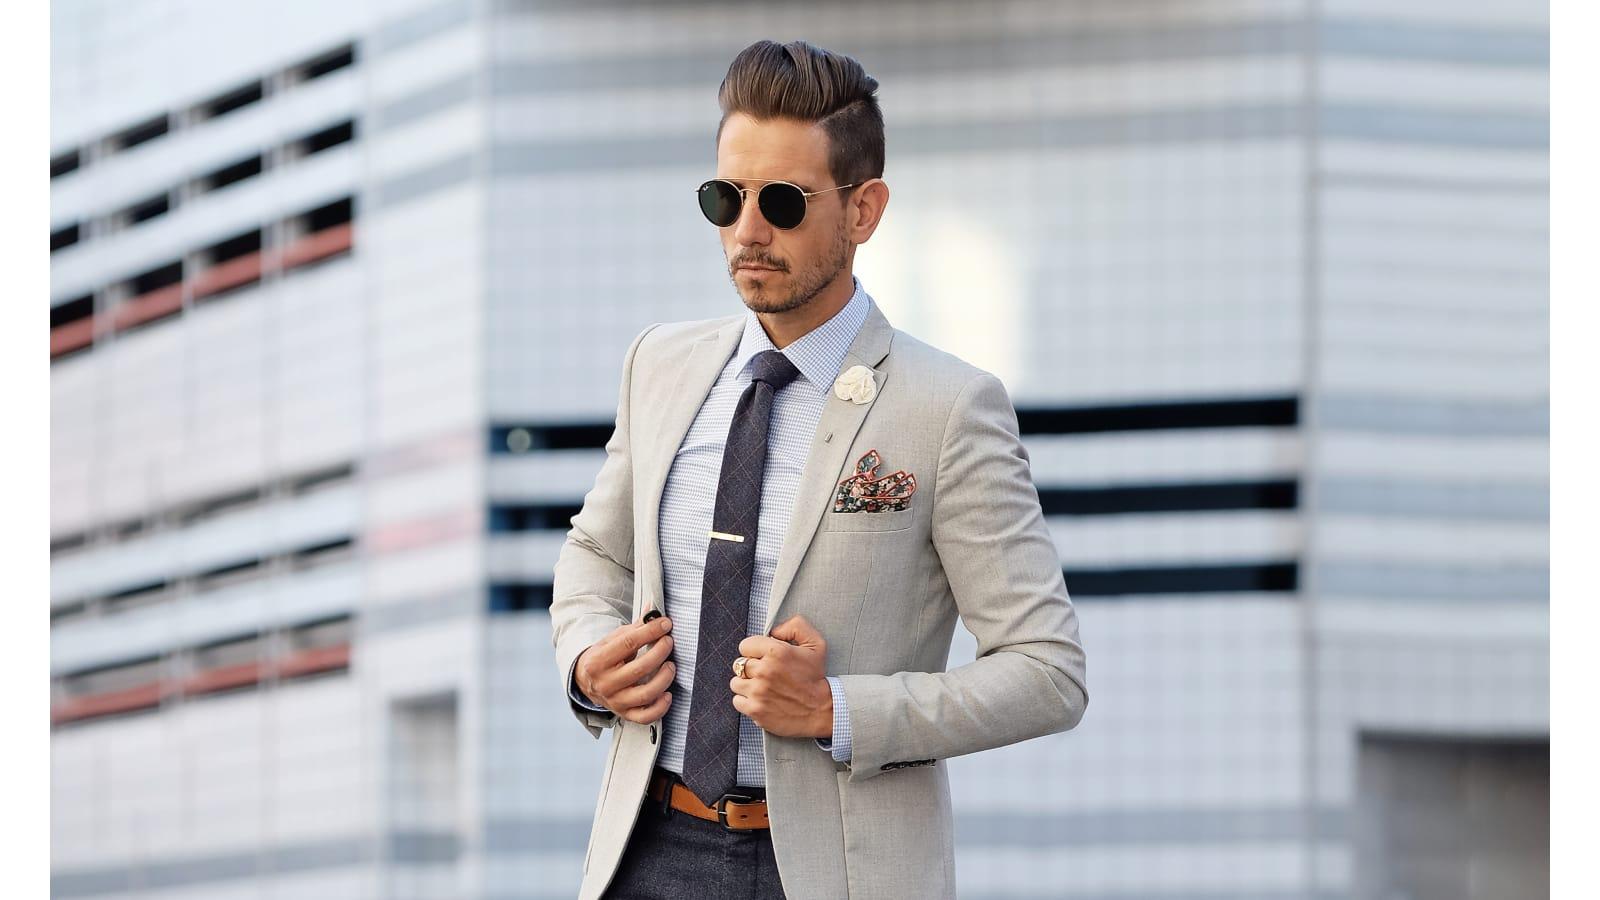 look masculino – Combine seu Look